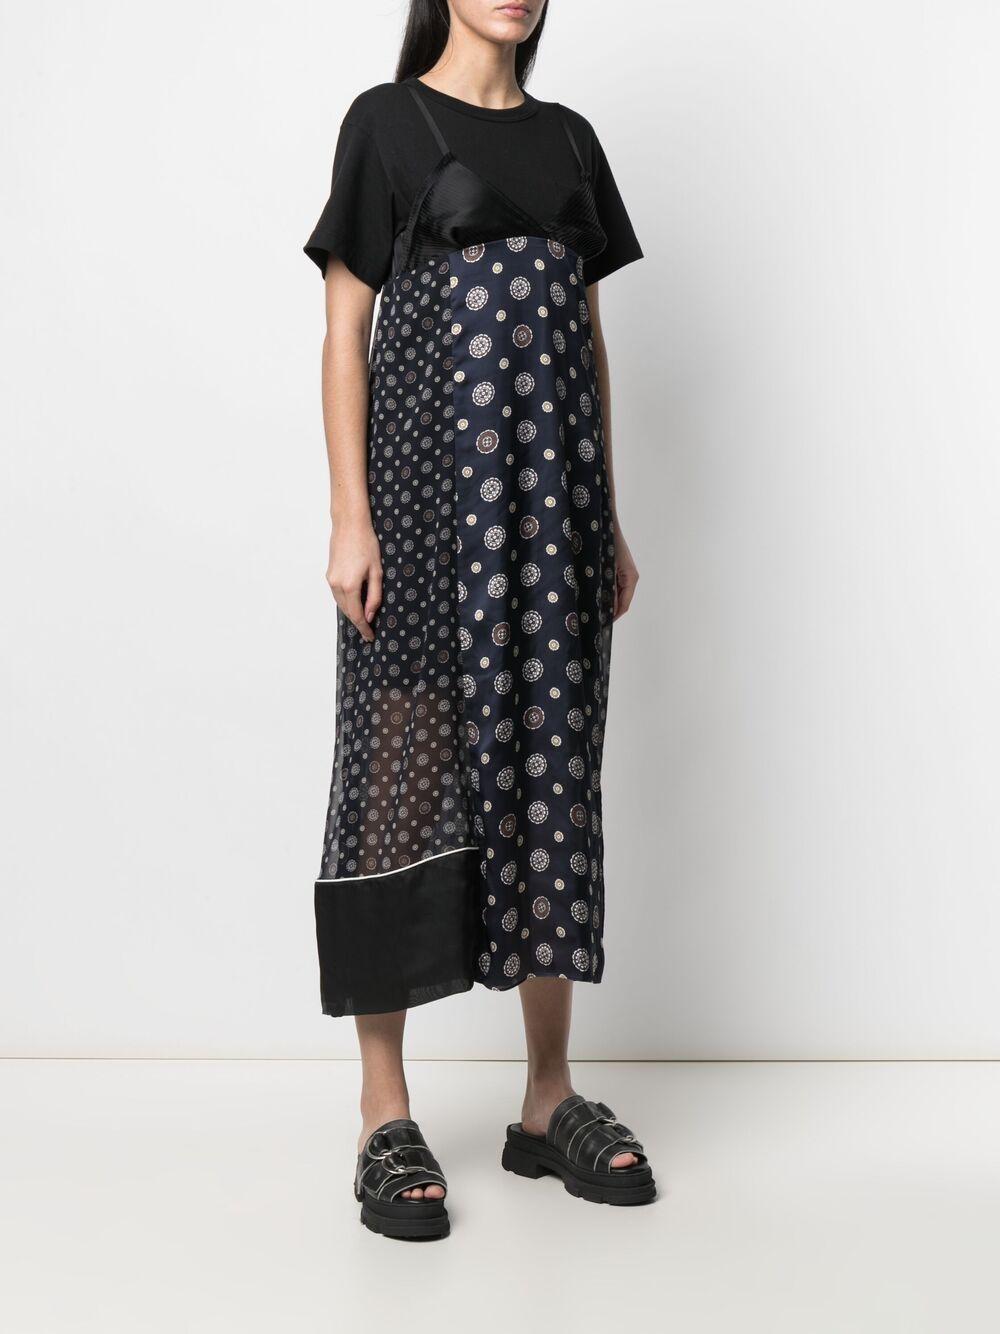 SACAI | Dress | 21-05590005